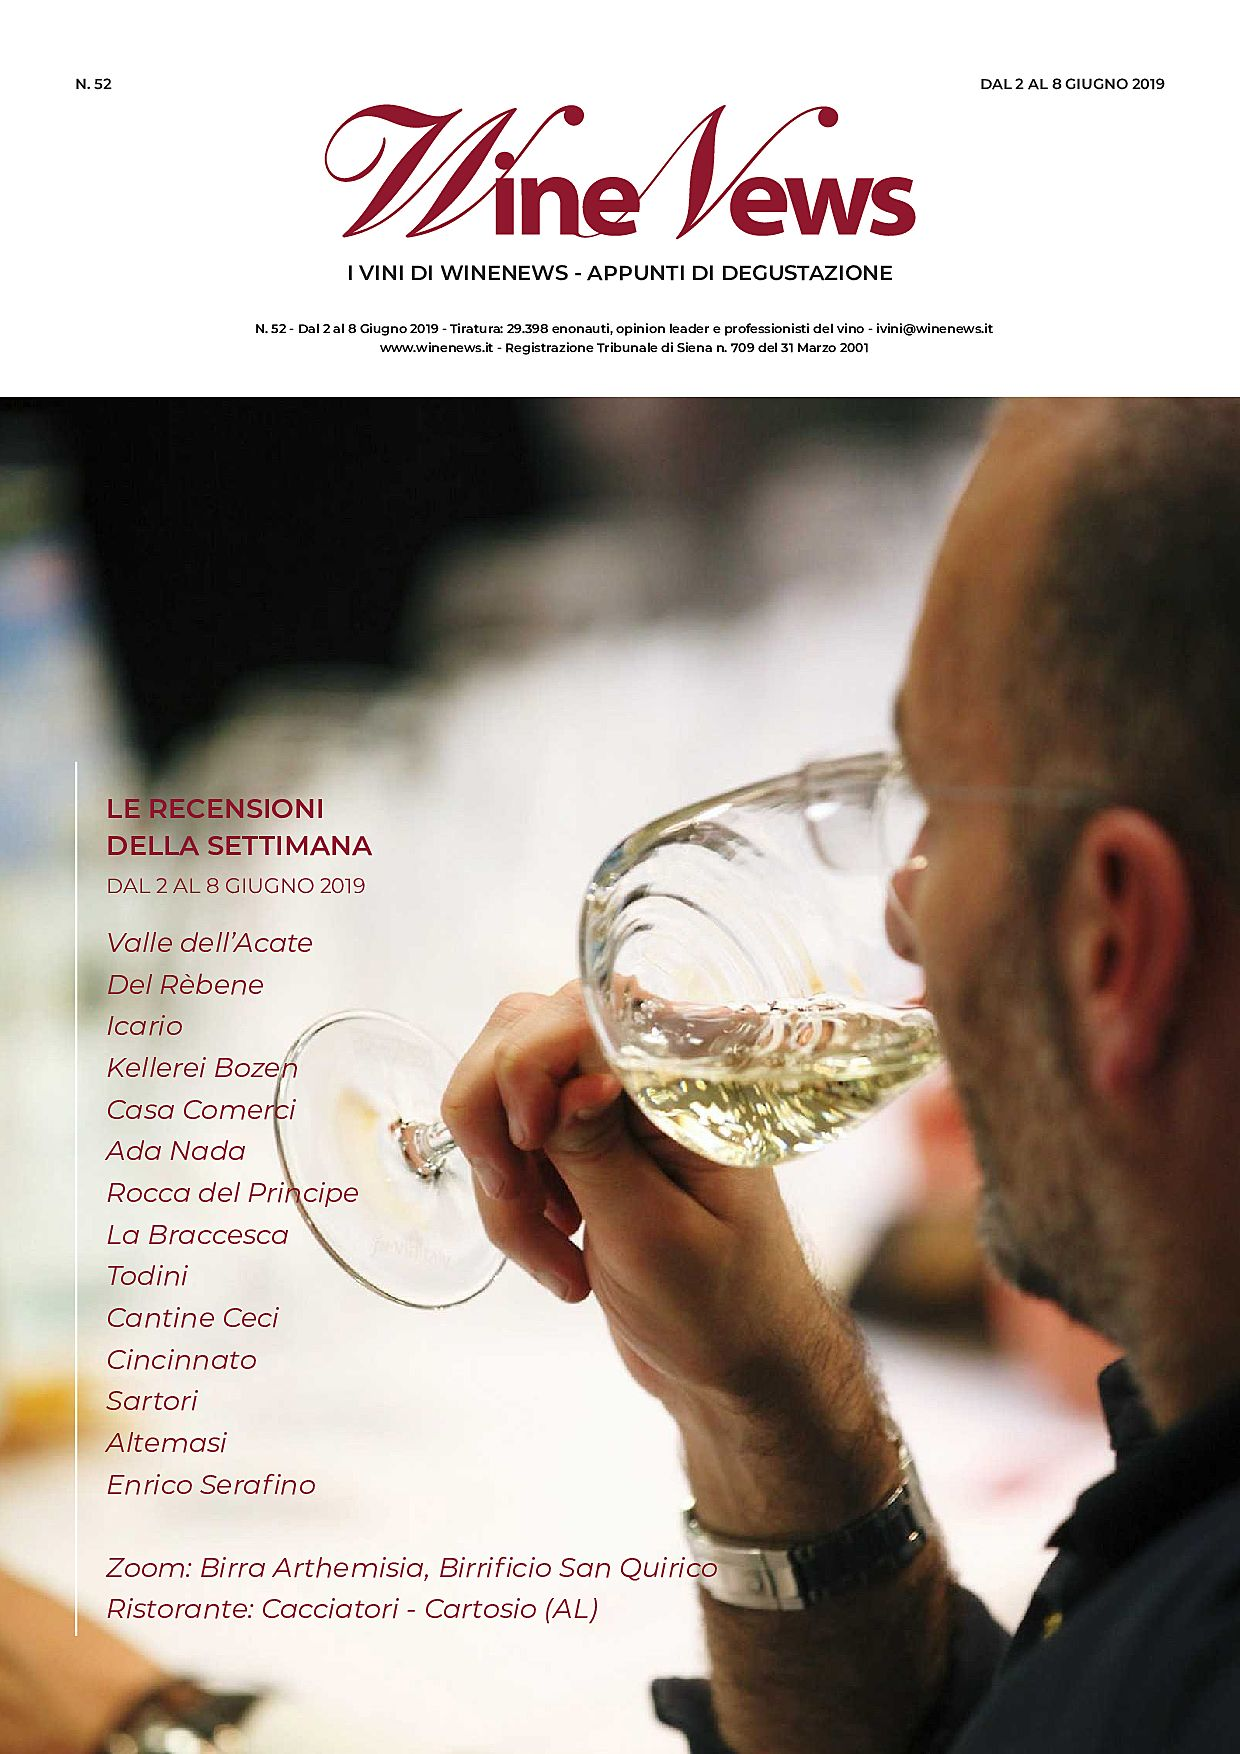 https://winenews.it/php/redirect_pdf.php?id=392006&t=1559314283